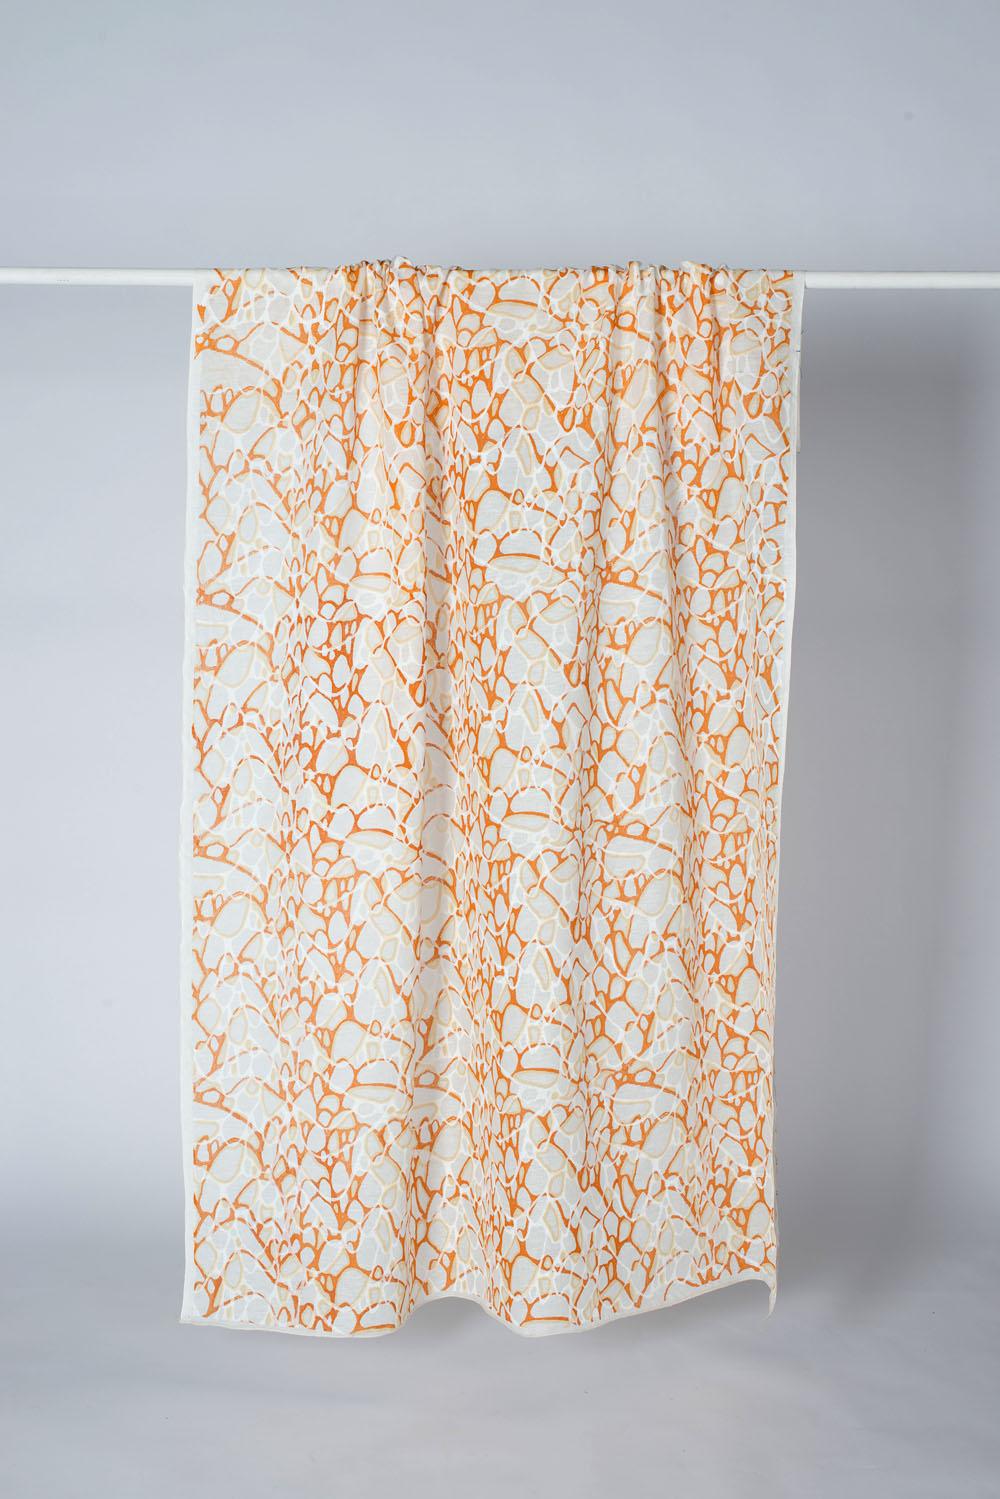 Screen printed on glas fiber weave